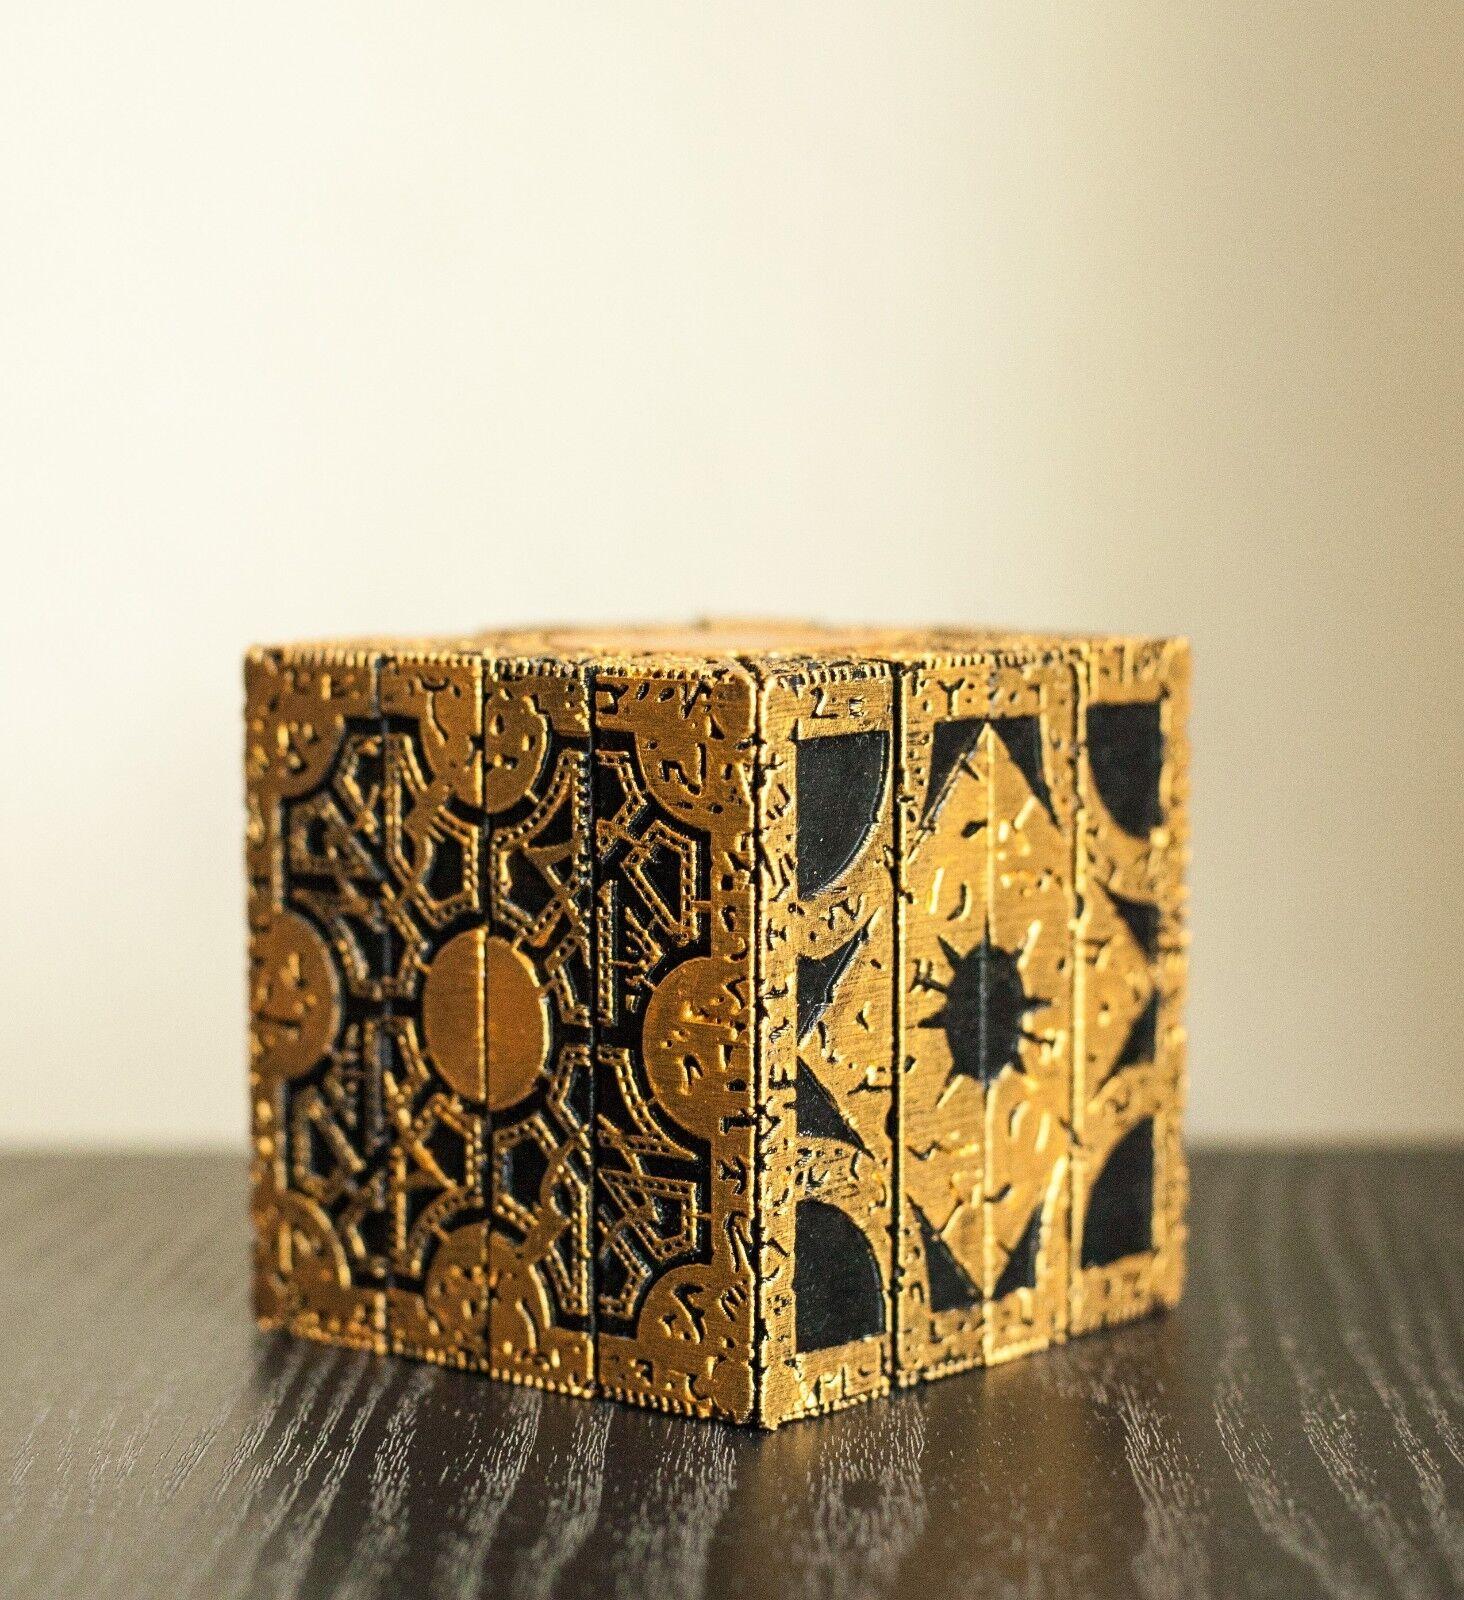 HELLRAISER puzzle box Lemarchand's box 3D Printed Lament Configuration Configuration Configuration gold f1b9eb